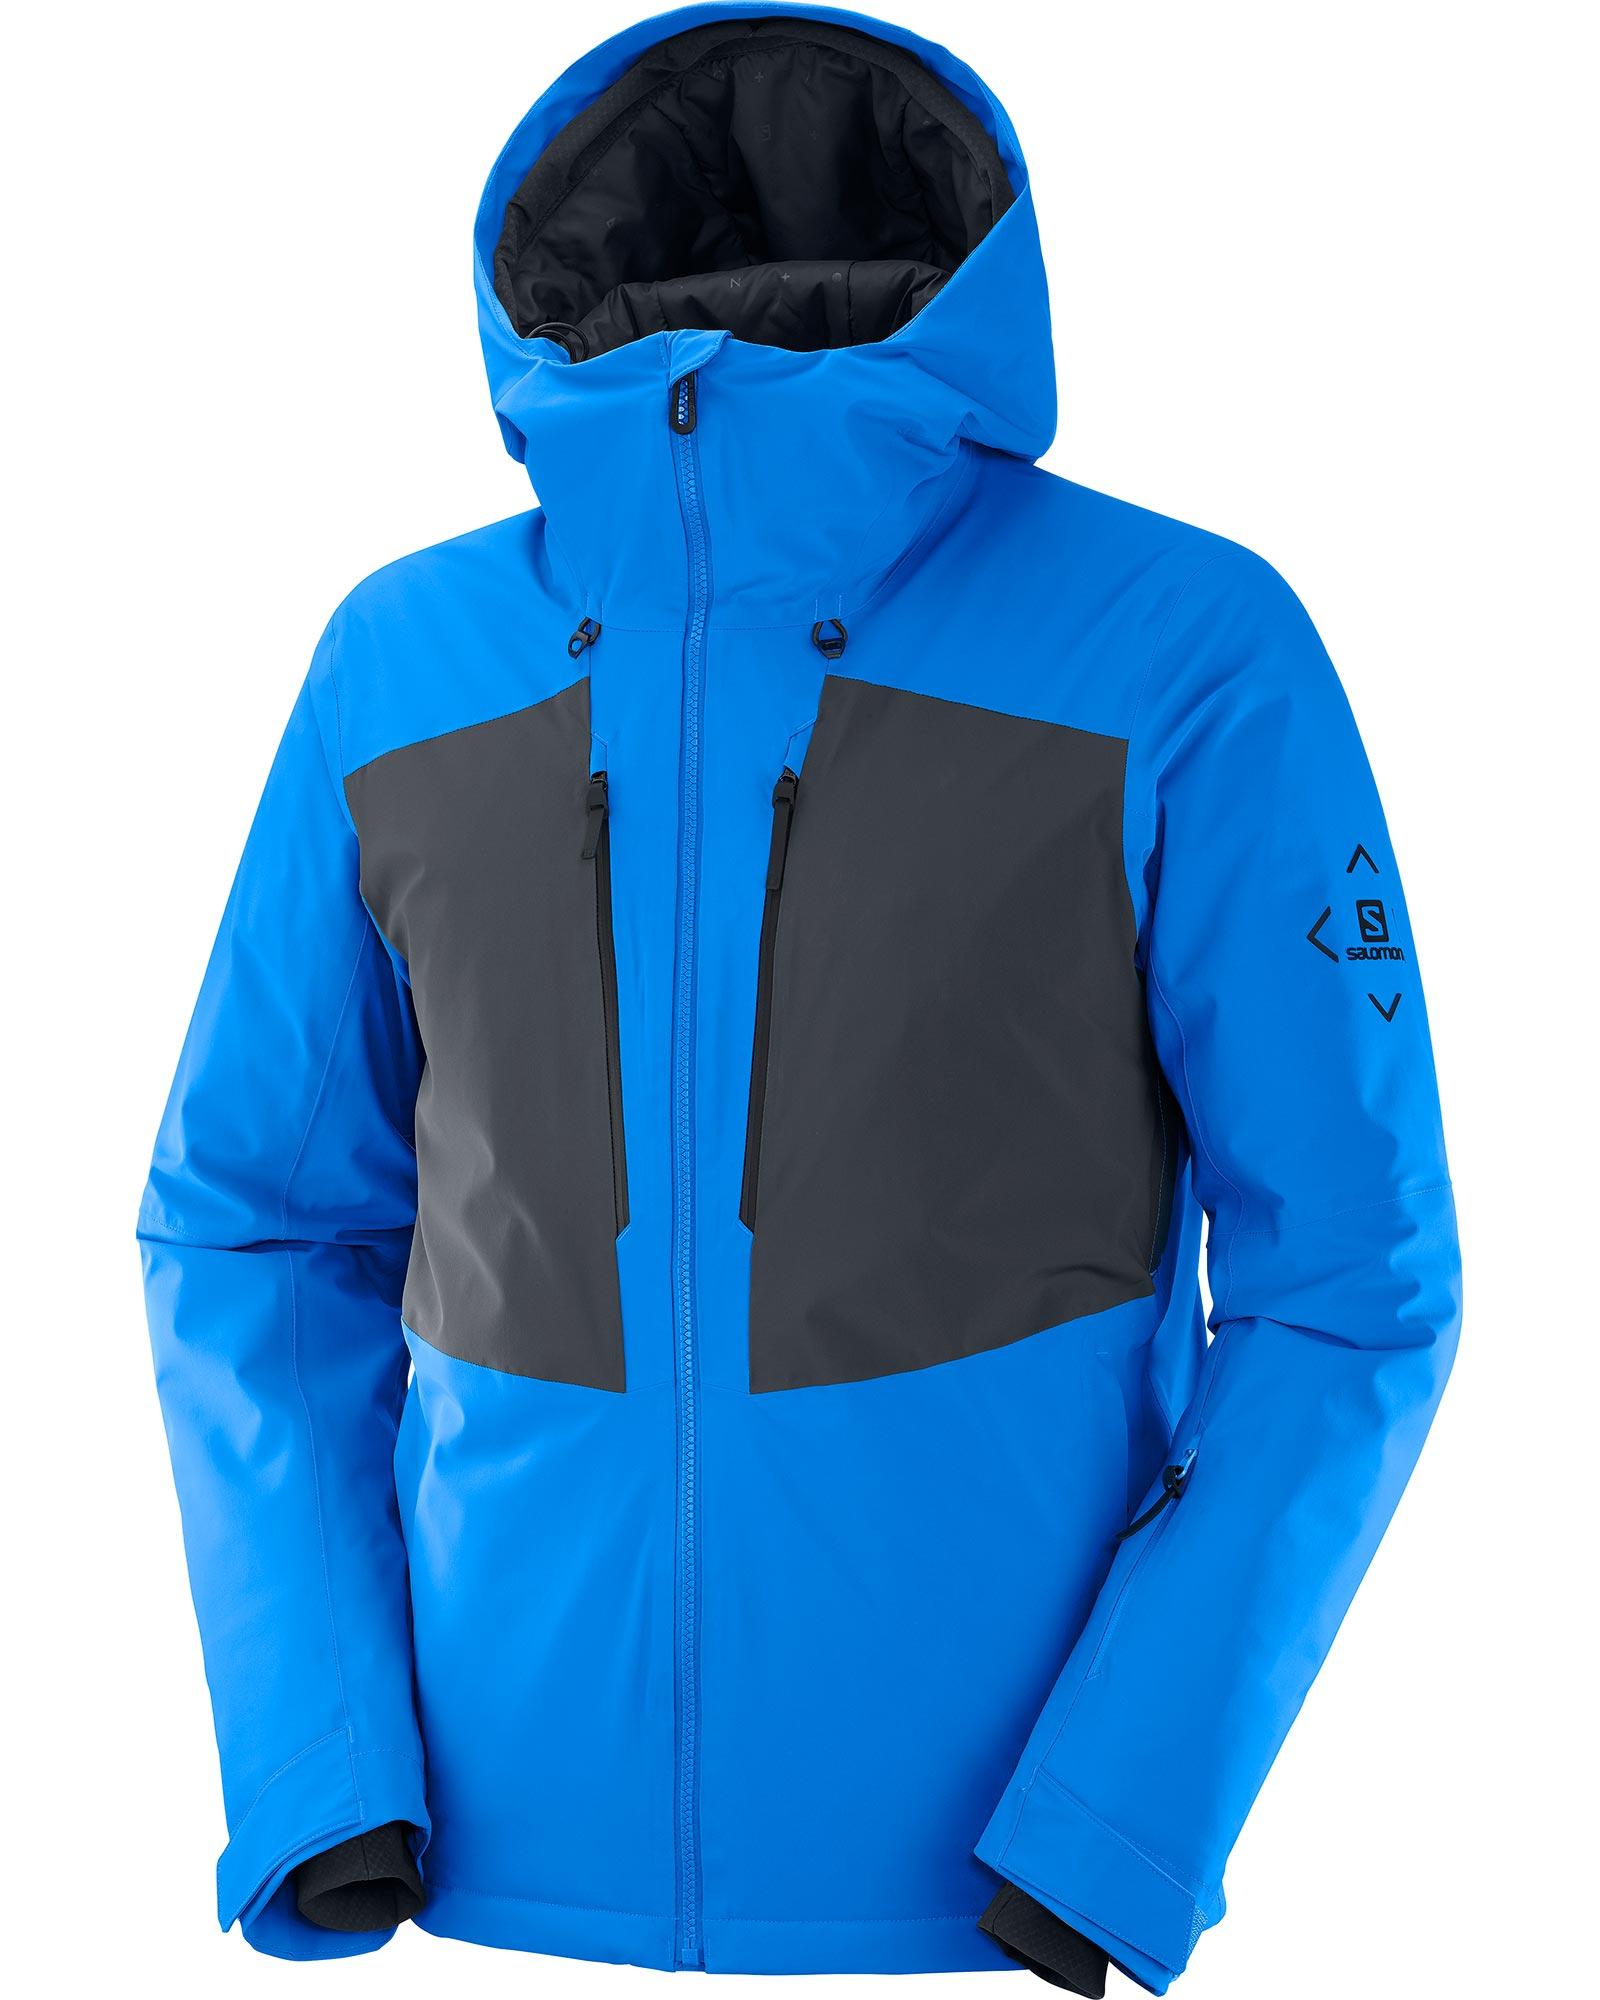 Salomon Men's Highland Ski Jacket 0